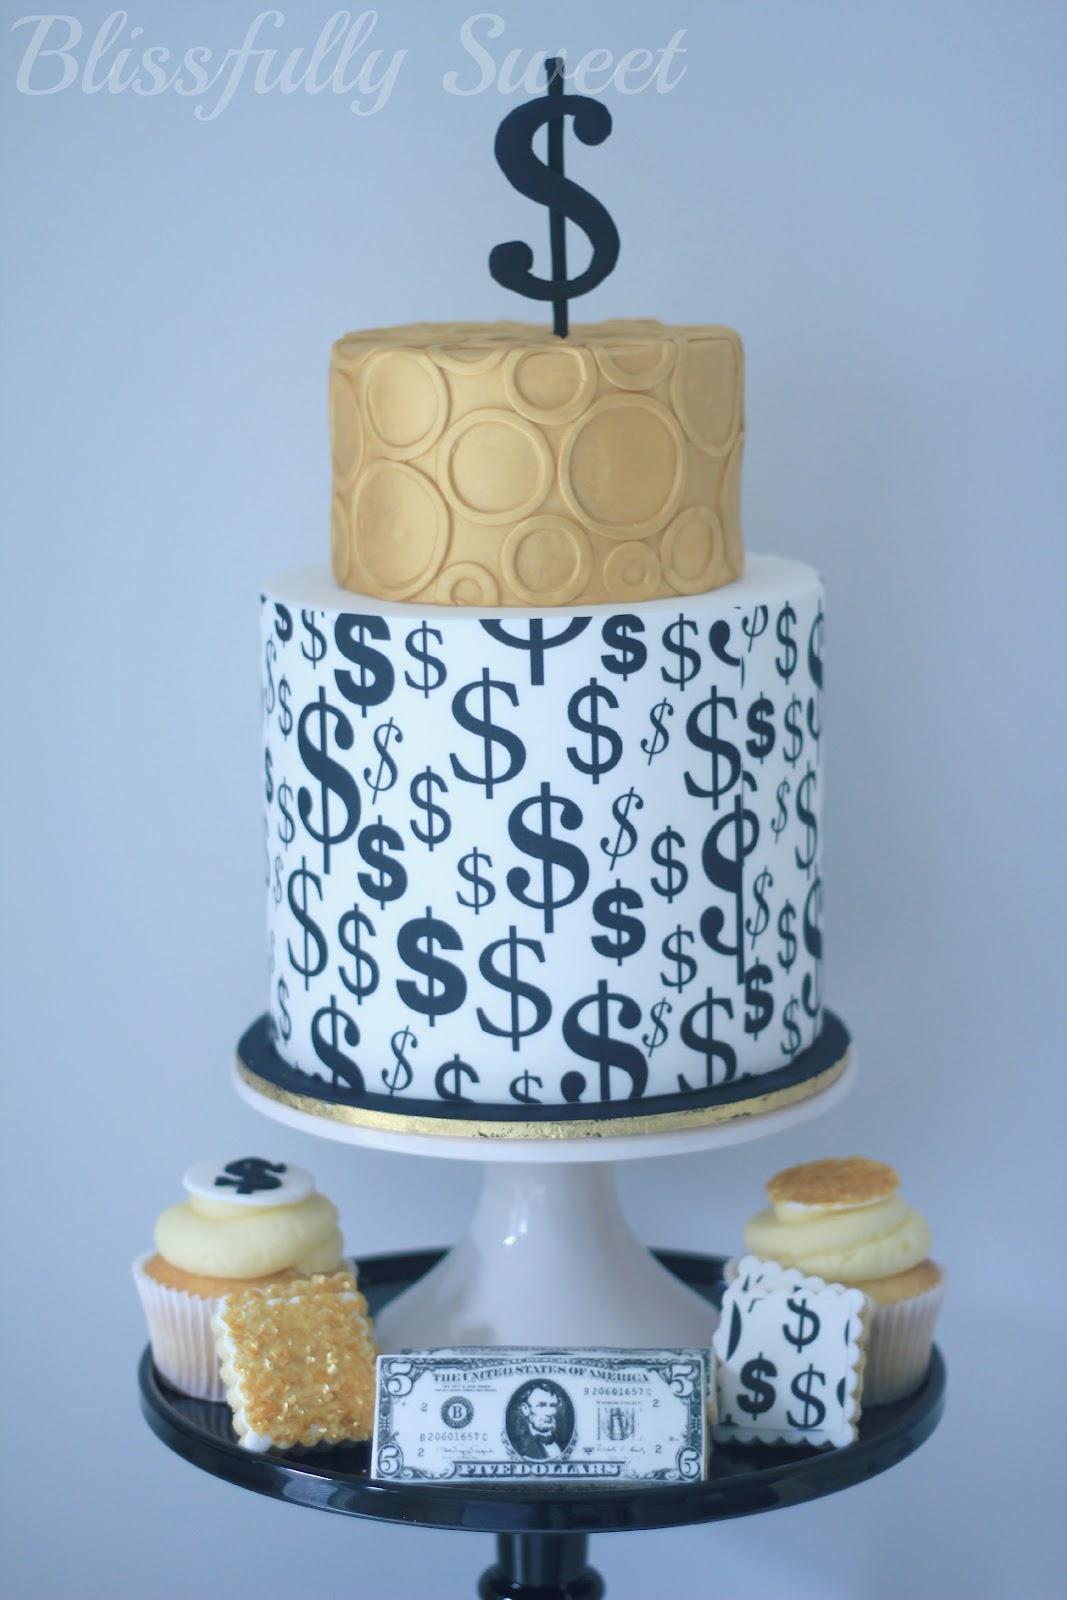 Blissfully sweet money money money themed cakes treats - Money cake decorations ...